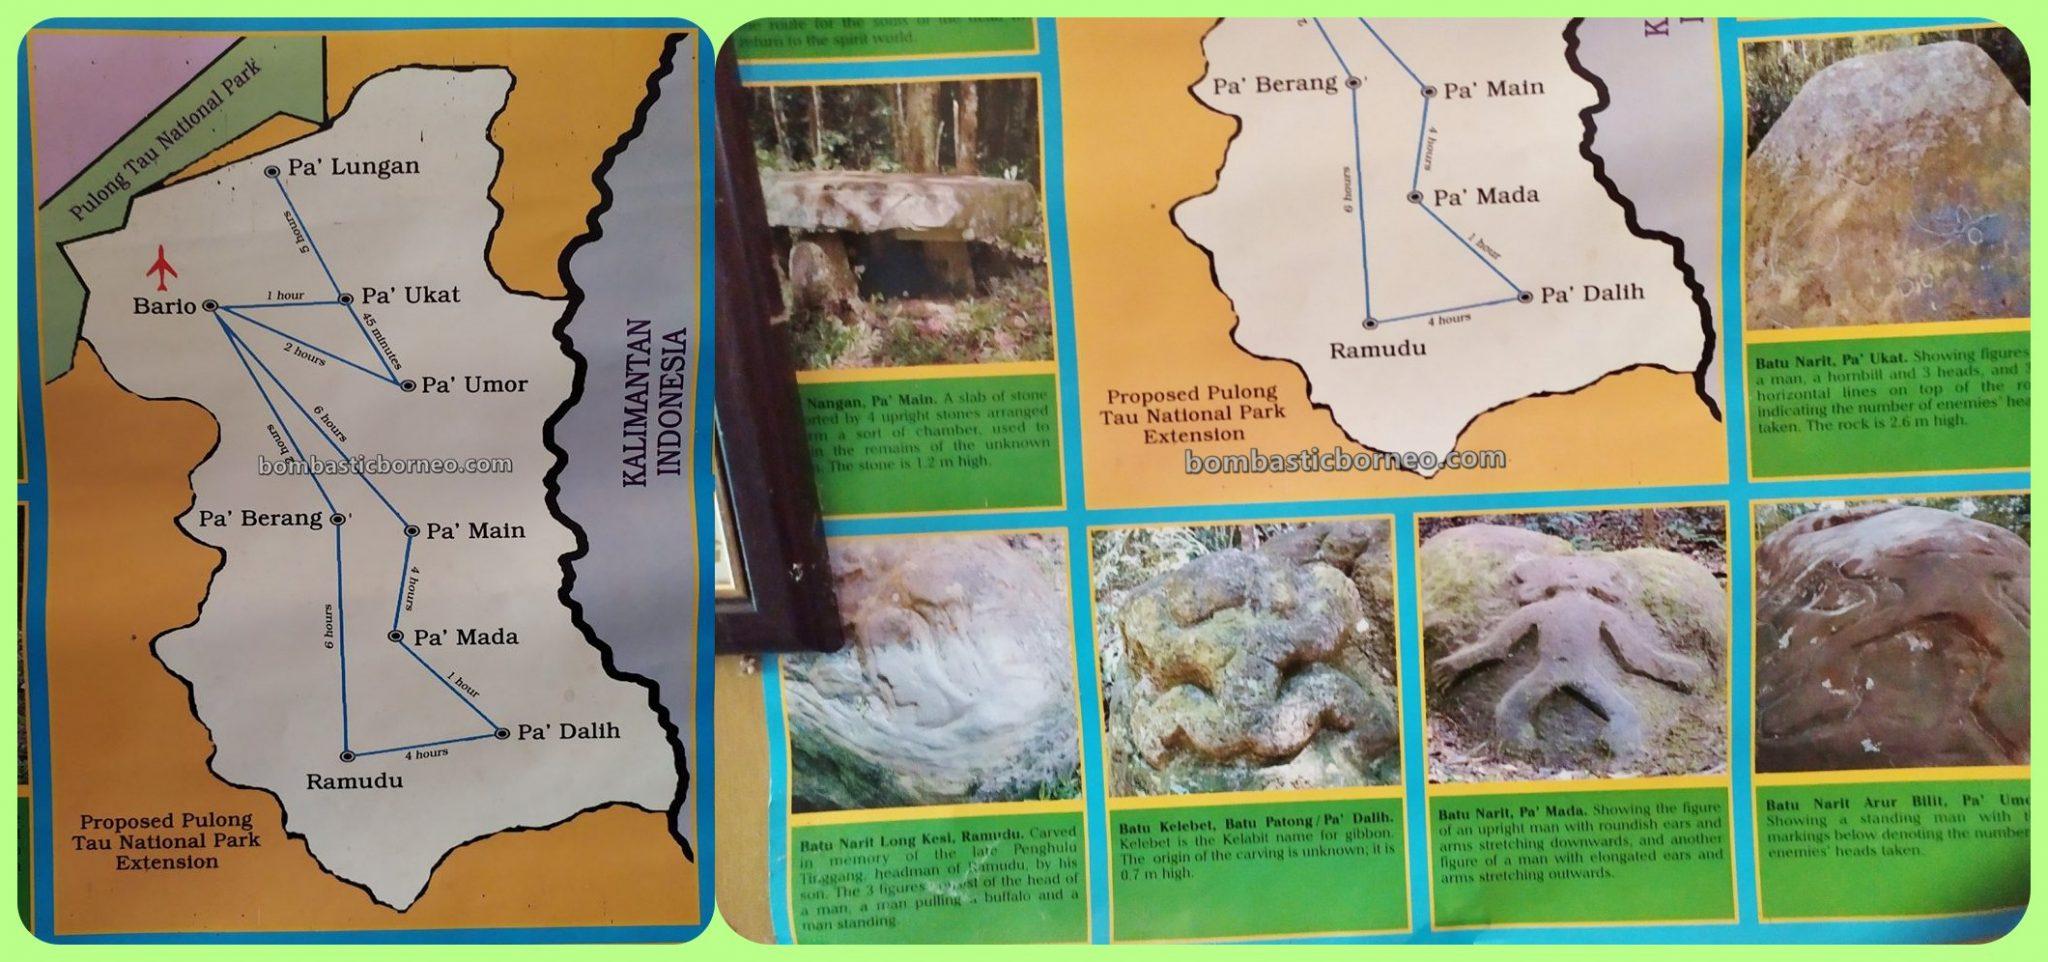 nature, taman negara, Bario. Kelabit Highlands. Tanah Tinggi Bario, backpackers, destination, exploration, Interior village, Orang Ulu, tourist attraction, travel guide, Trans Borneo, 穿越婆罗洲砂拉越, 巴里奥国家公园